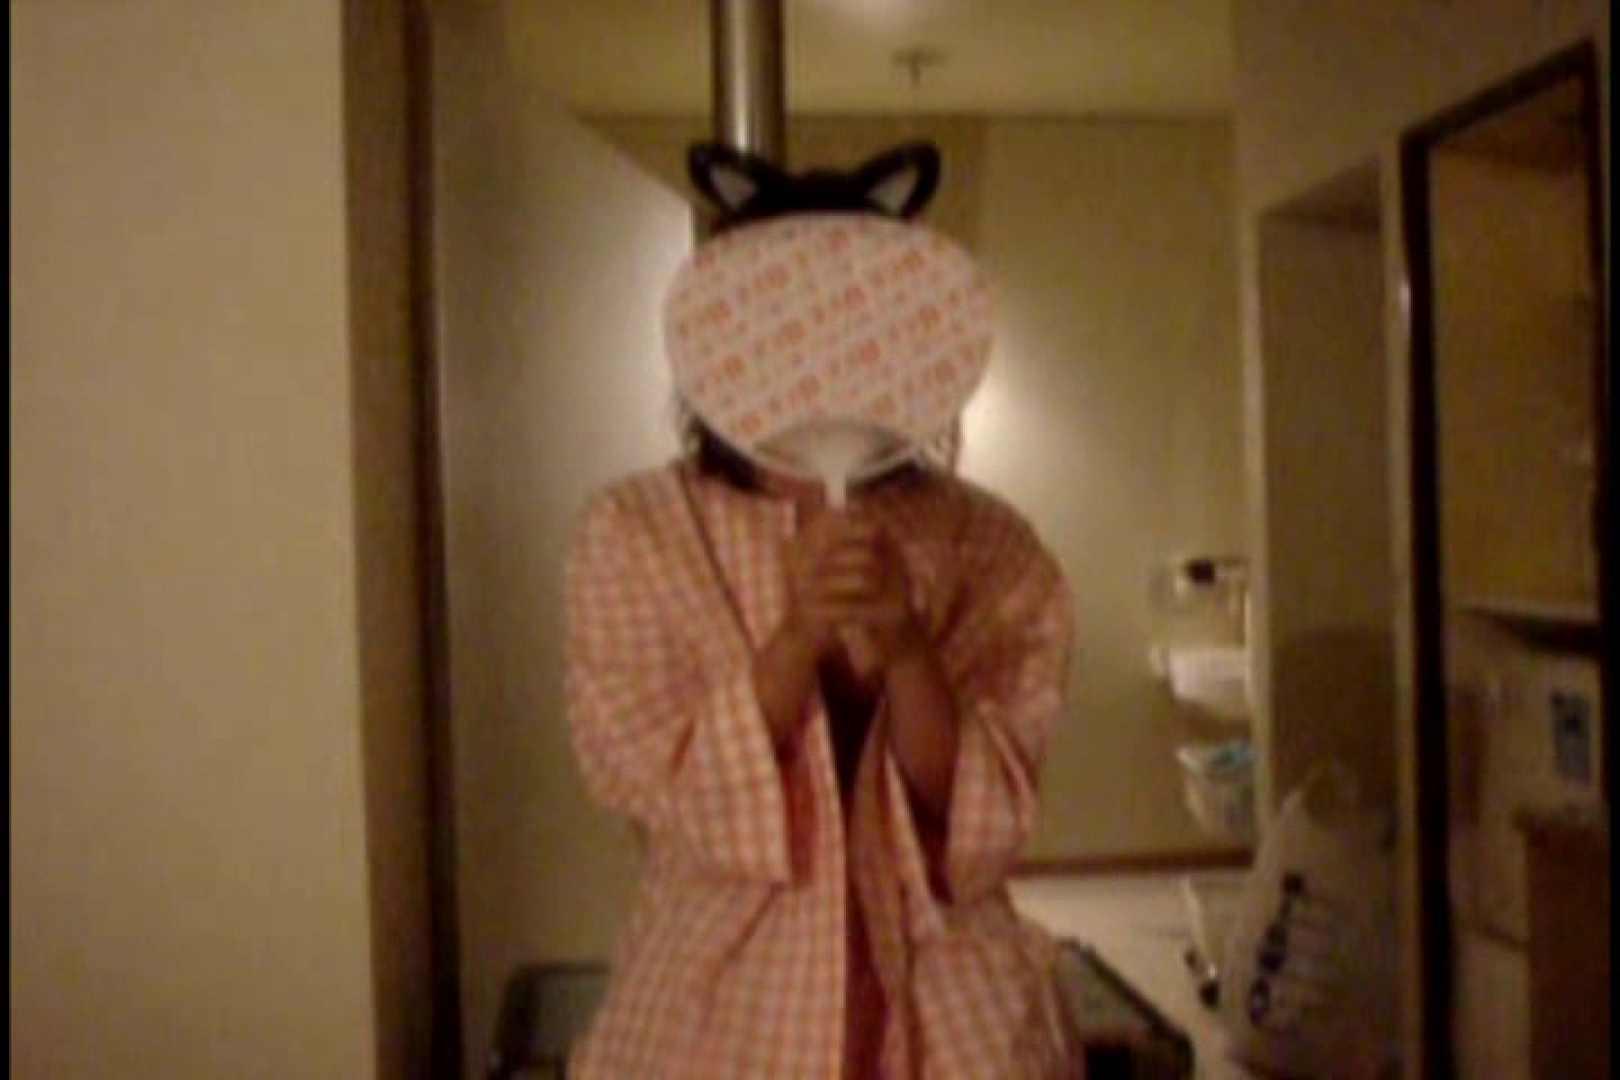 ウイルス流出 九州工学部女子大生藤野瑠美 超エロ女子大生  109枚 84